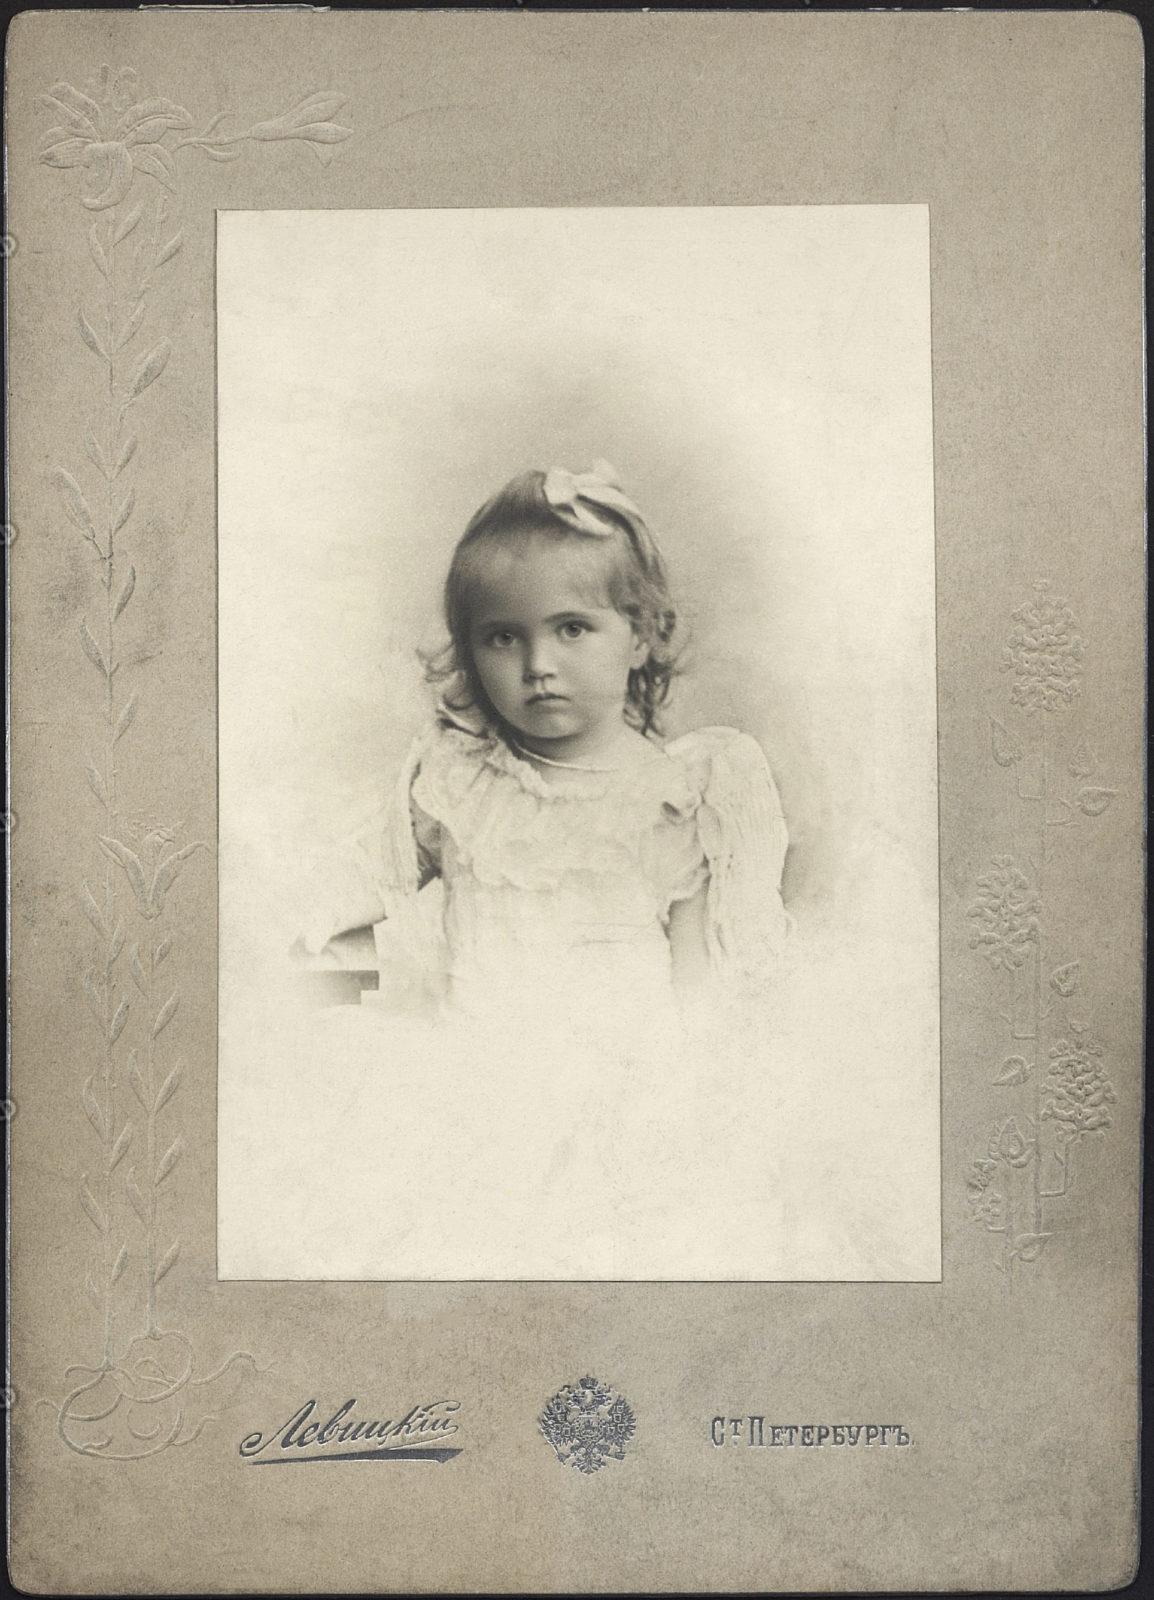 Grand Duchess Maria Nikolaevna. The third daughter of Emperor Nicholas II and Empress Alexandra Feodorovna. Photo of Levitsky.